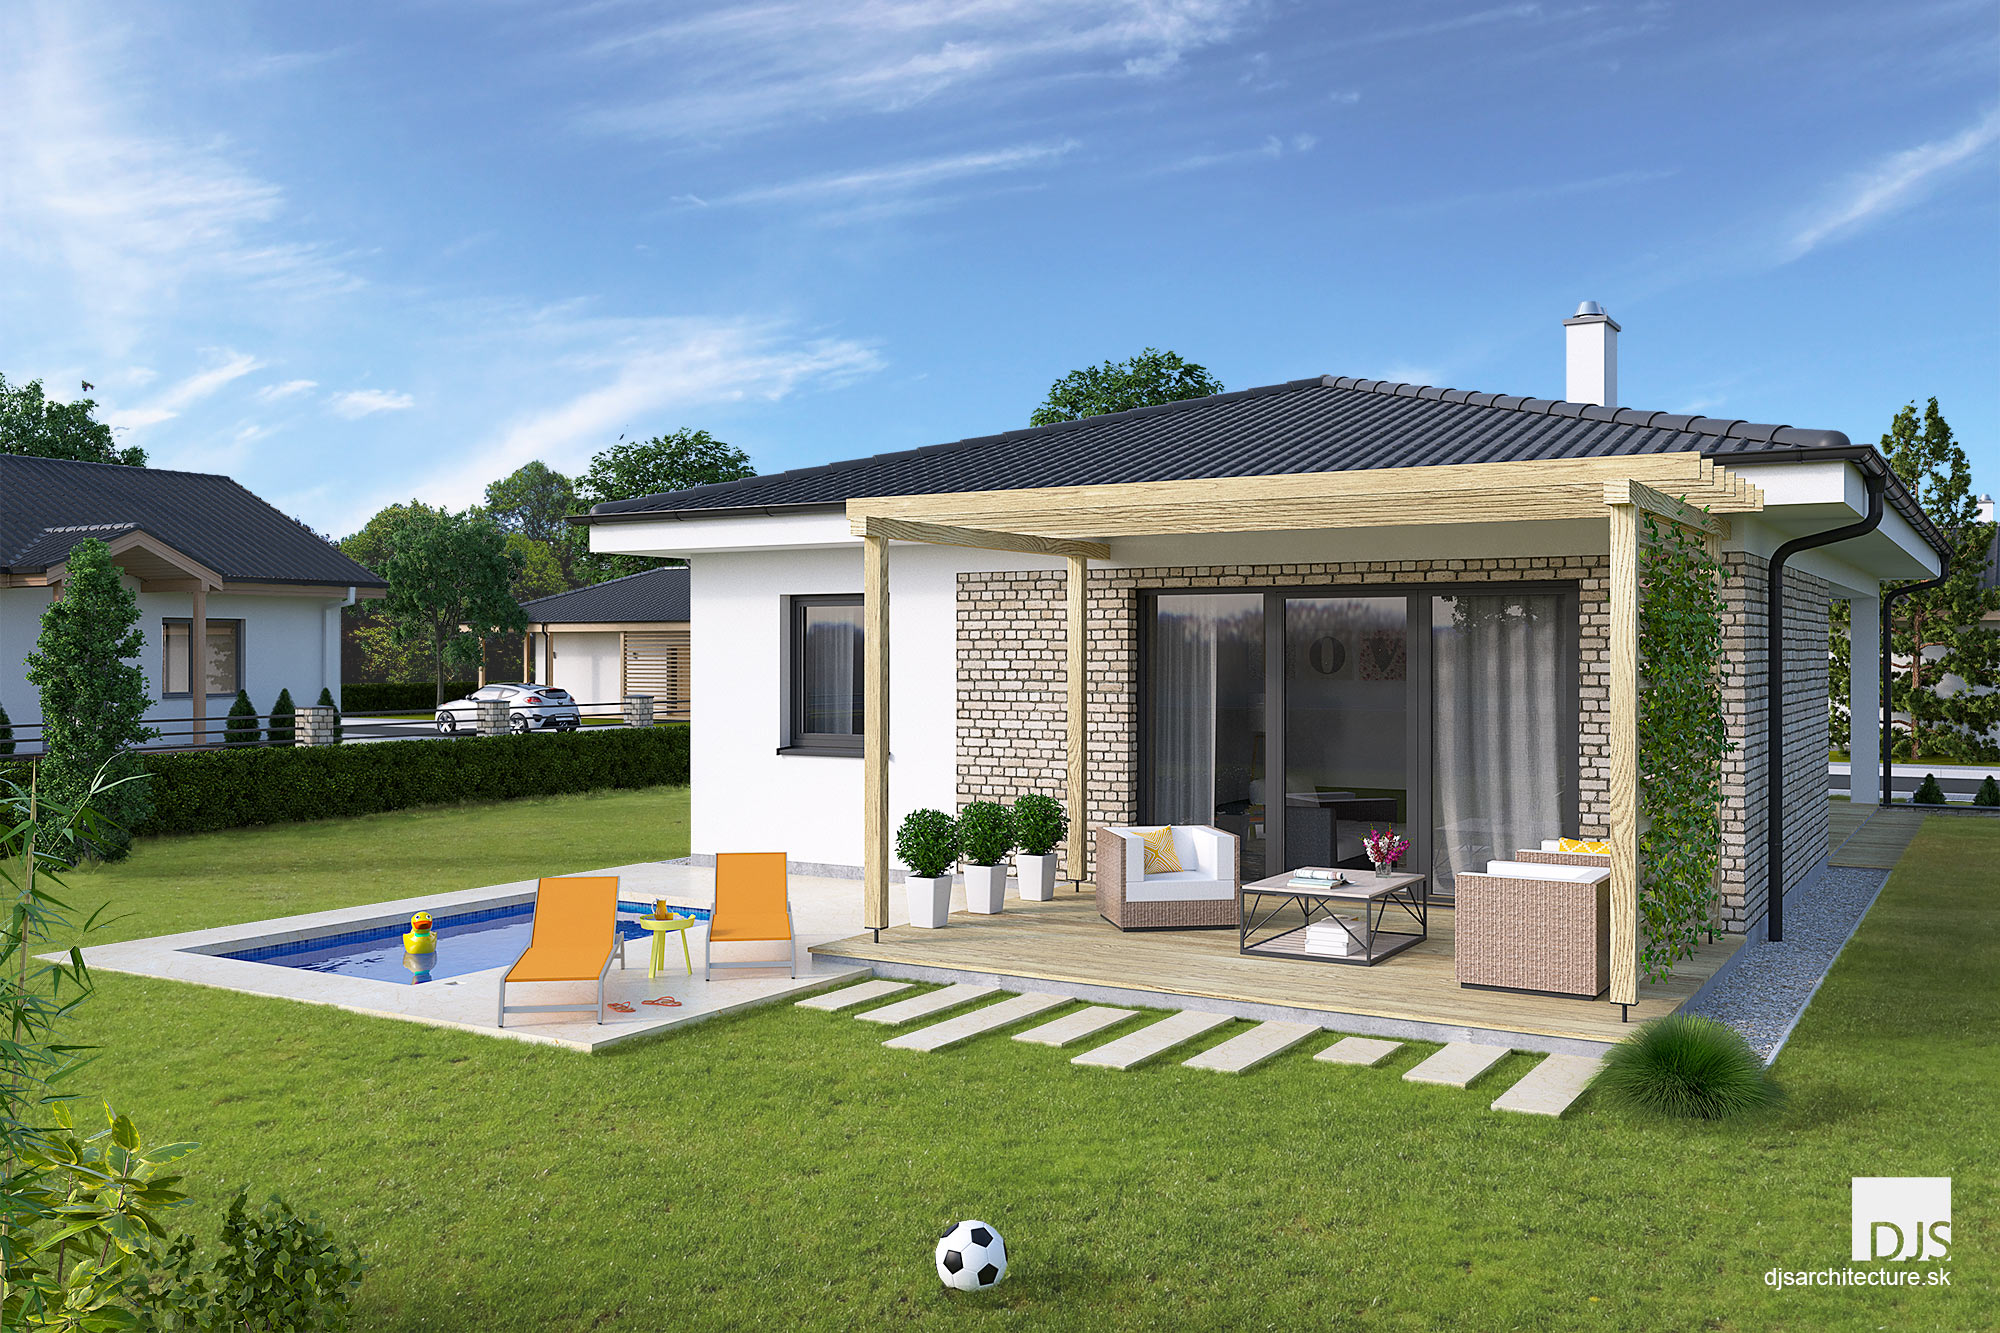 House plans - small l-shaped bungalow L75 | DJS Architecture on new house design plans, floating dock plans, biltmore estate elevation plans, vardo camper plans,